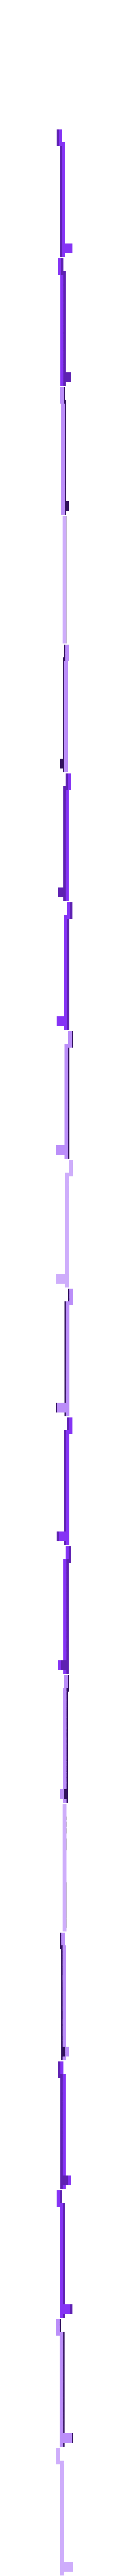 Pillar.stl Download free STL file The Rainbow Apparatus • 3D print model, Urukgar4D